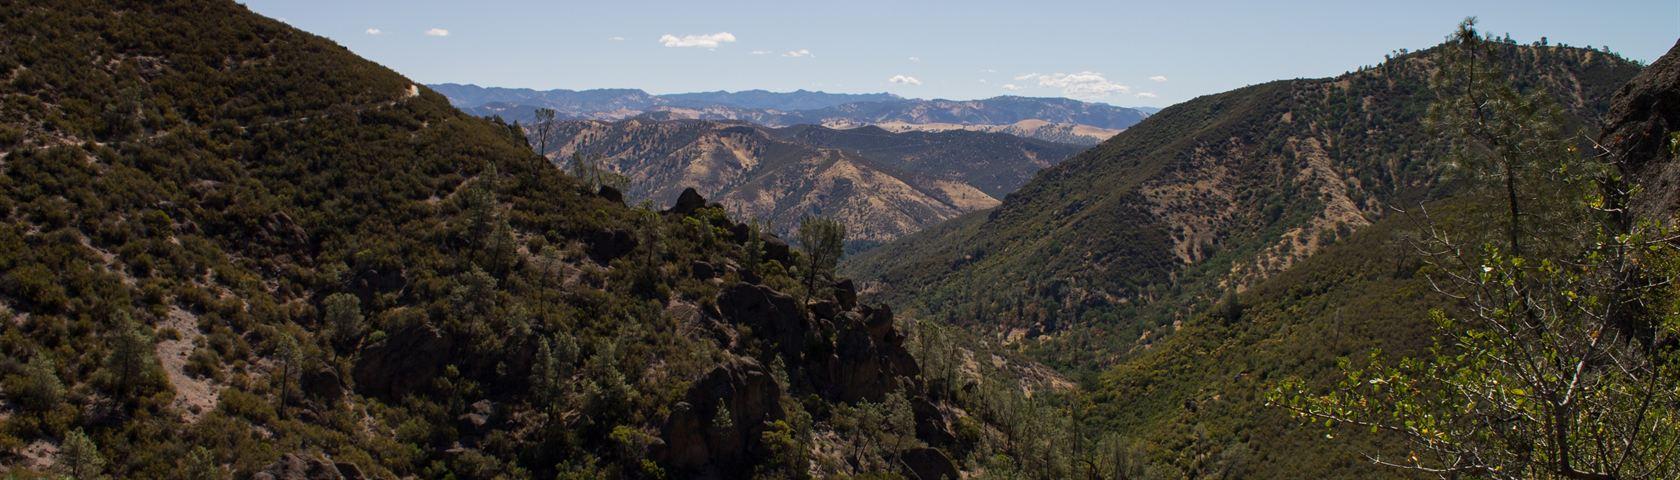 Pinnacle's Mountain Valley